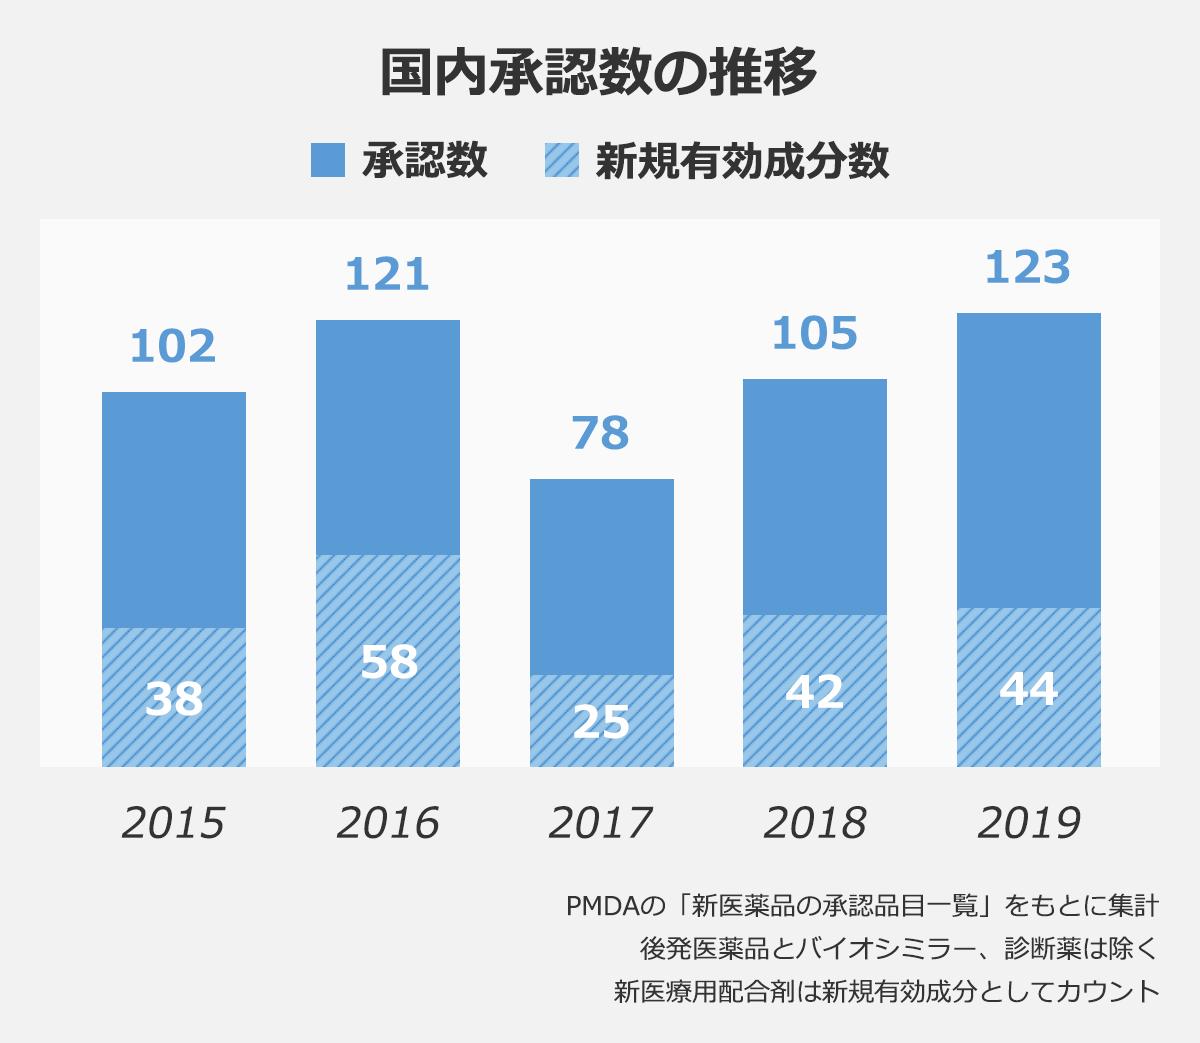 【国内承認数の推移のグラフ】 (年度/承認数/新規有効成分数): 2015/102/38  2016/121/58  2017/78/25  2018/105/42  2019/123/44